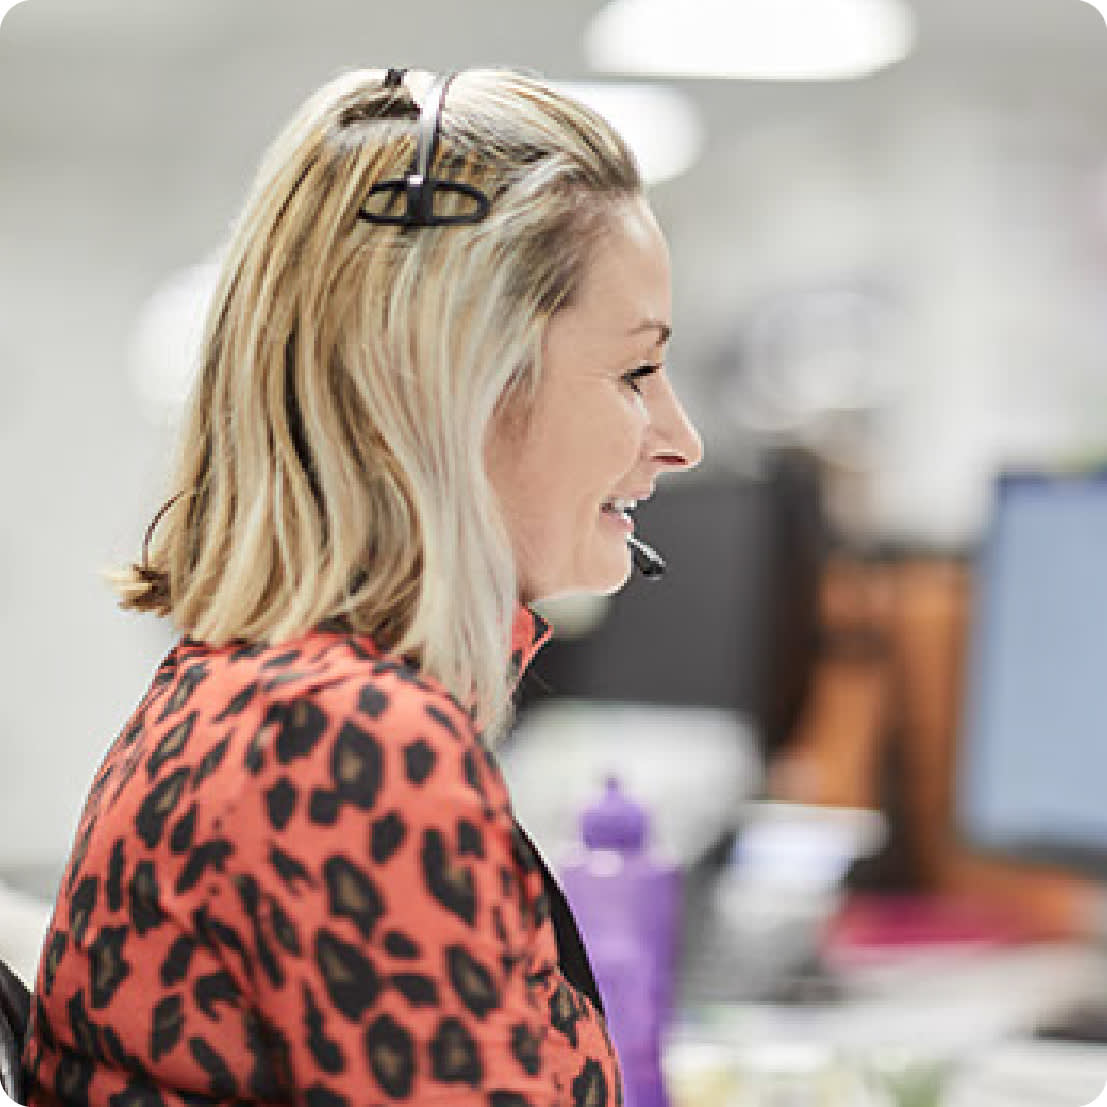 UK-based customer service, plus 24/7 online access - Image